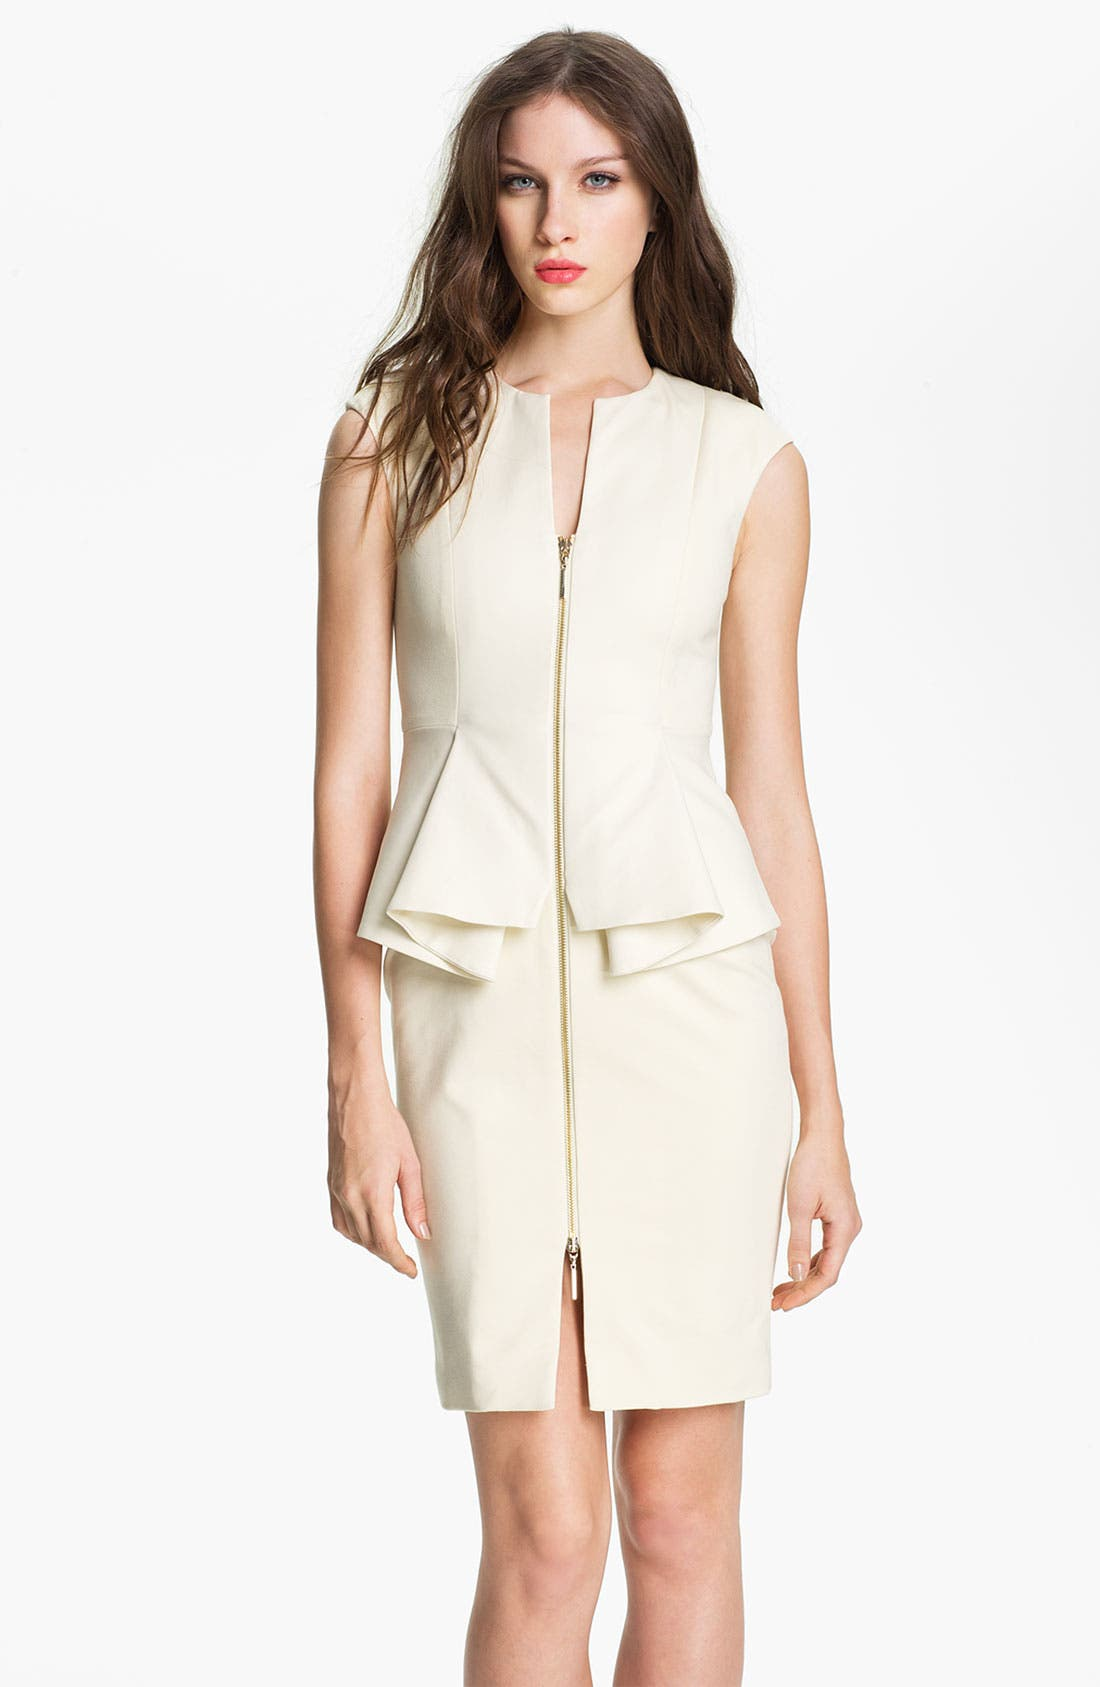 Alternate Image 1 Selected - Ted Baker London Cotton Blend Sheath Dress